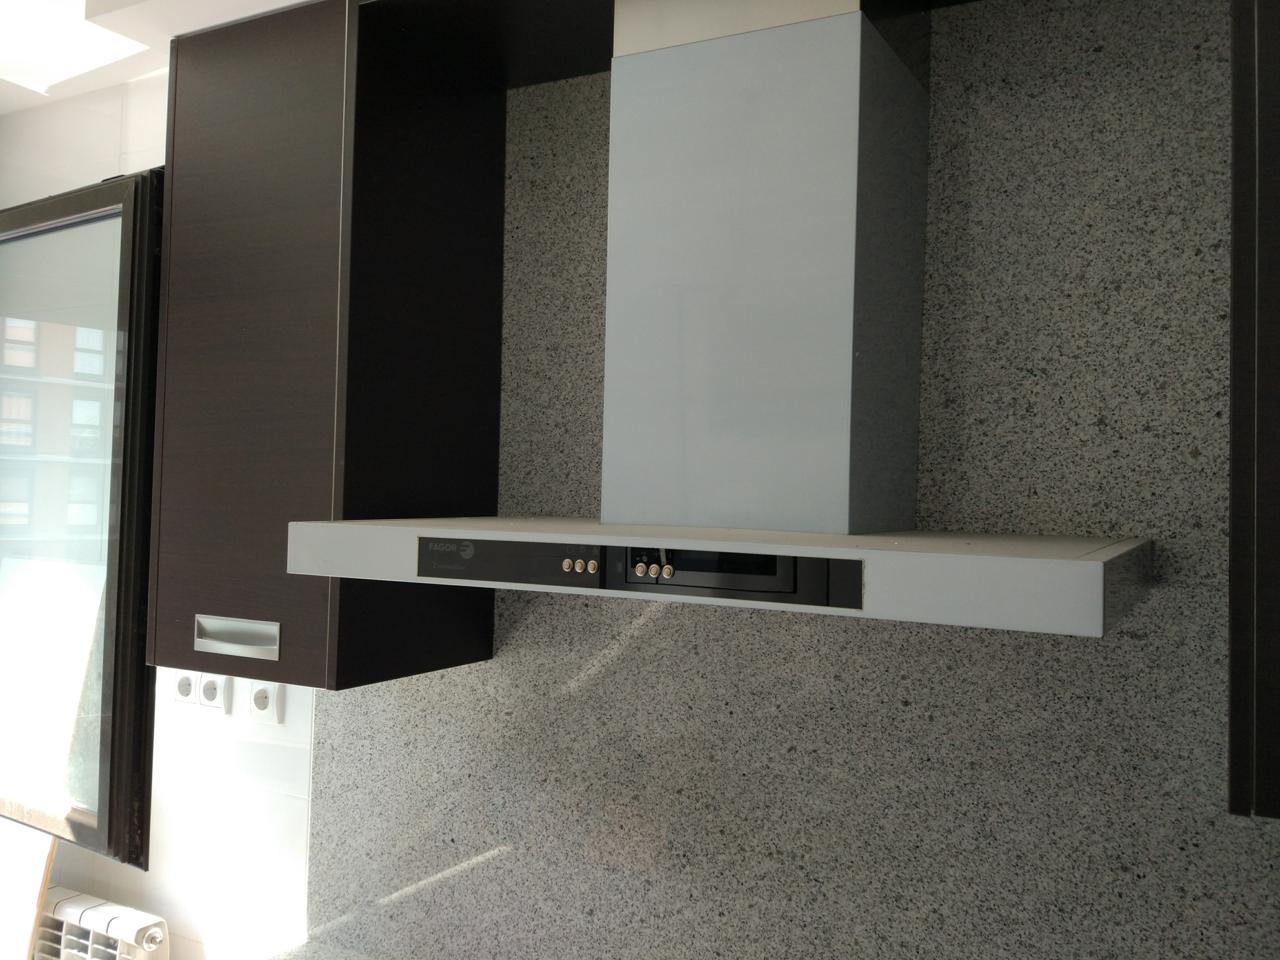 piso inversores con inquilino obra nueva zaragoza|publipisos inmobiliarias-13